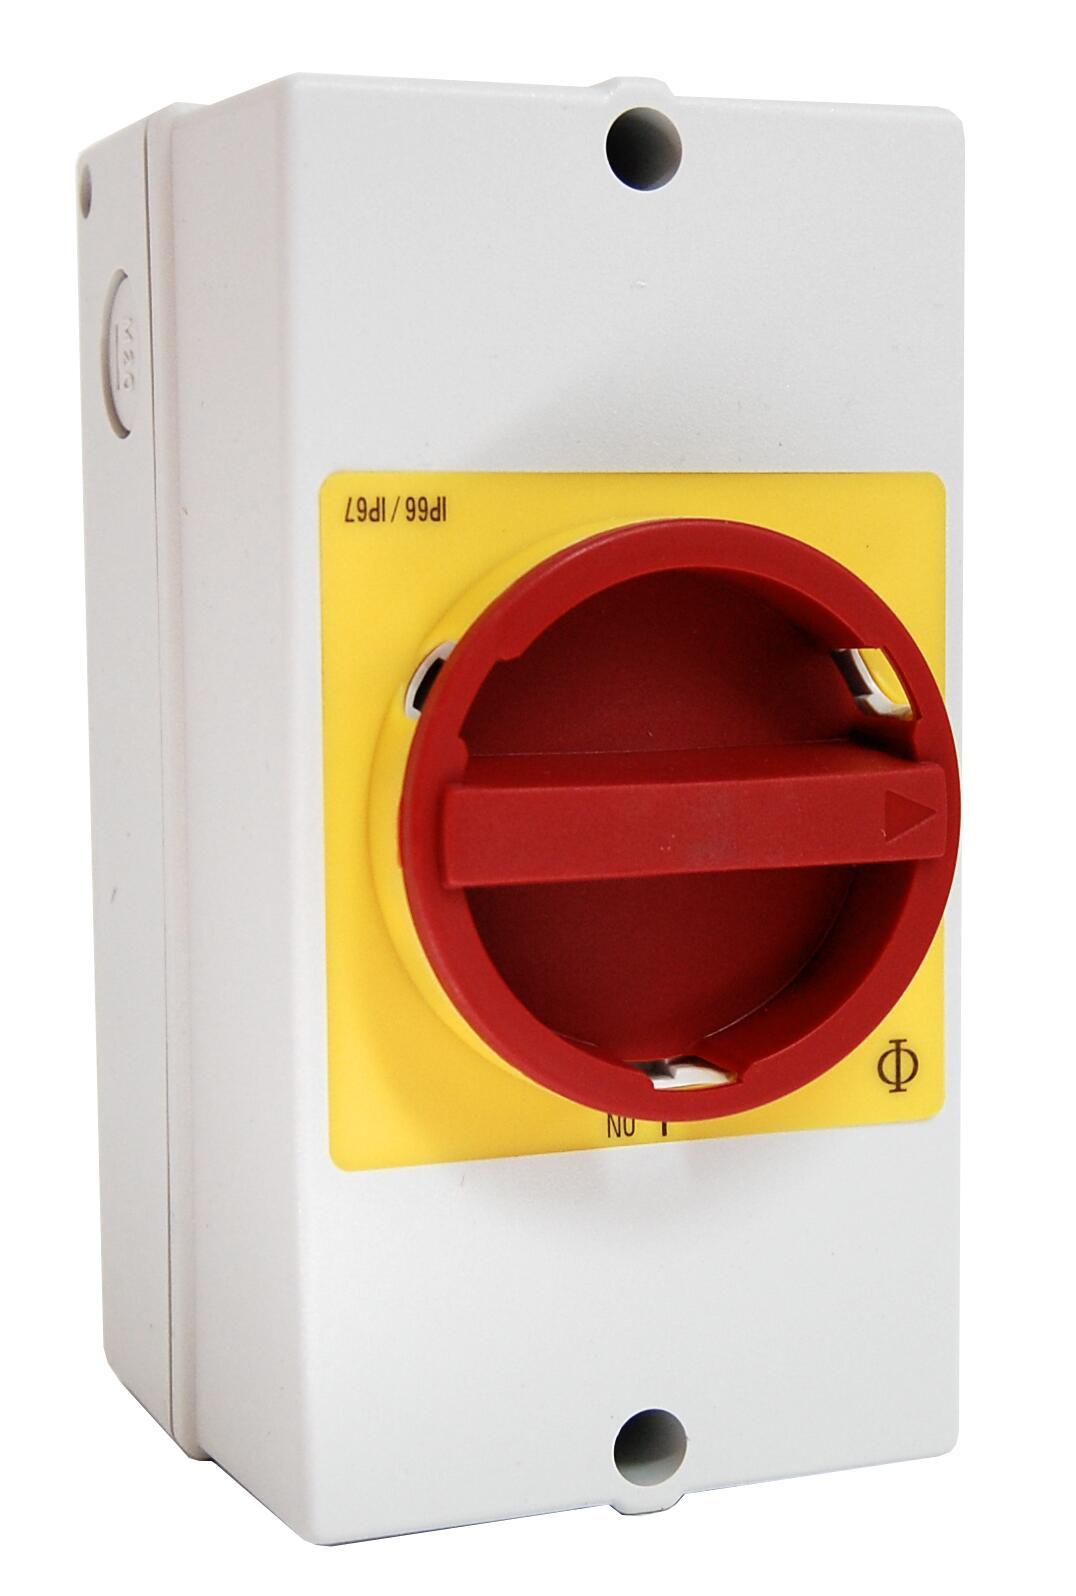 1 Stk Not-Aus-Schalter, 3-polig + 2 Hilfskontakte, PE-Klemme, 25A IN892001--